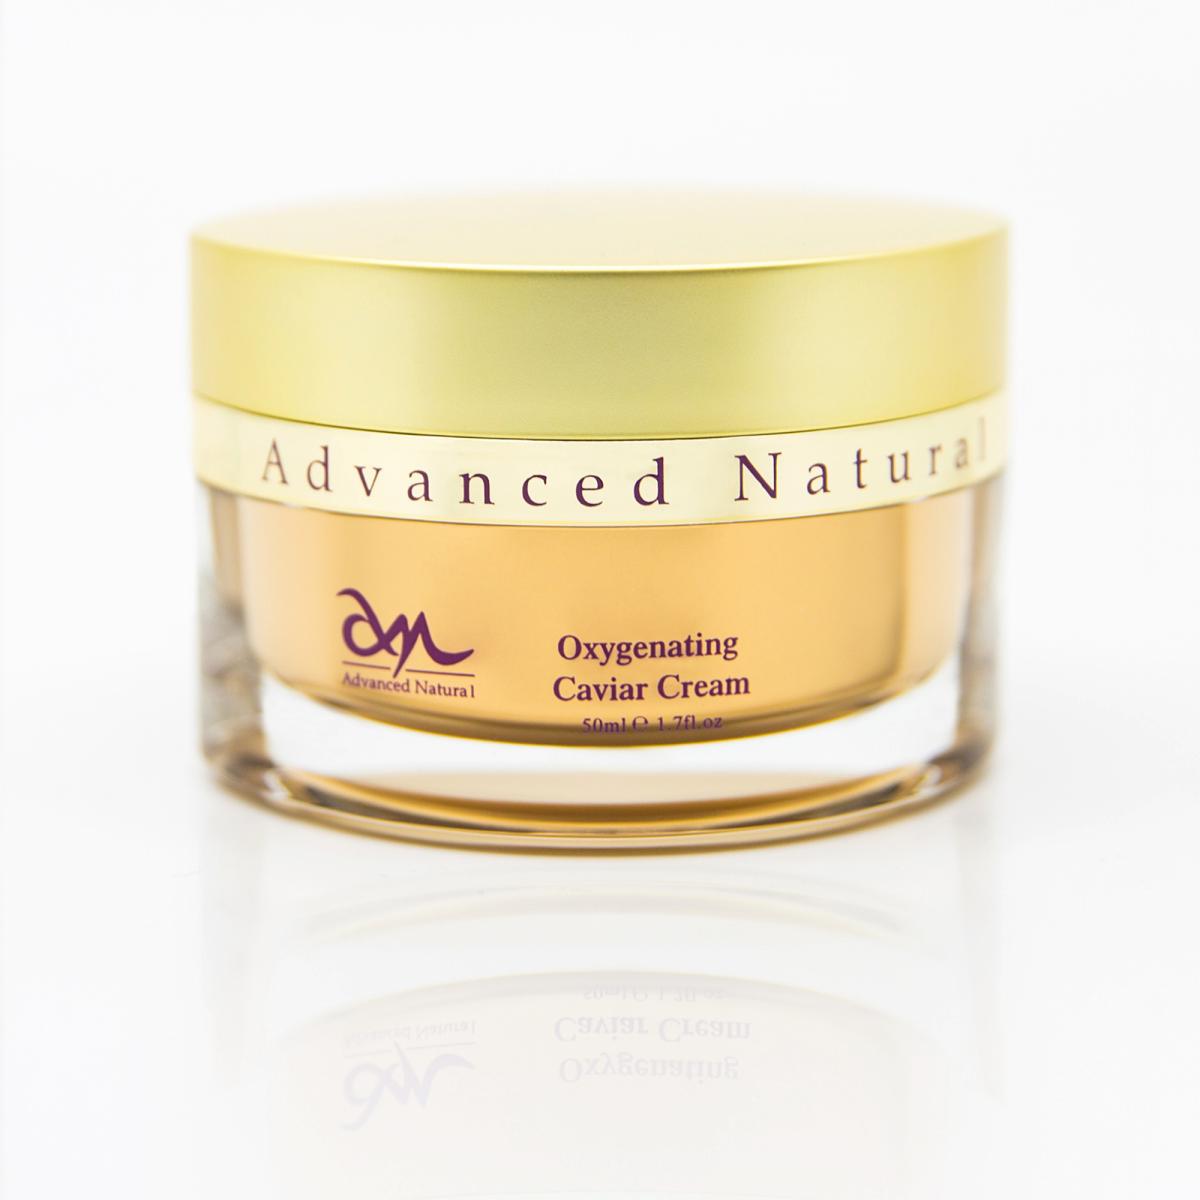 Advanced Natural Skin Care Oxygenating Caviar Cream Кислородный крем с икрой  для лица